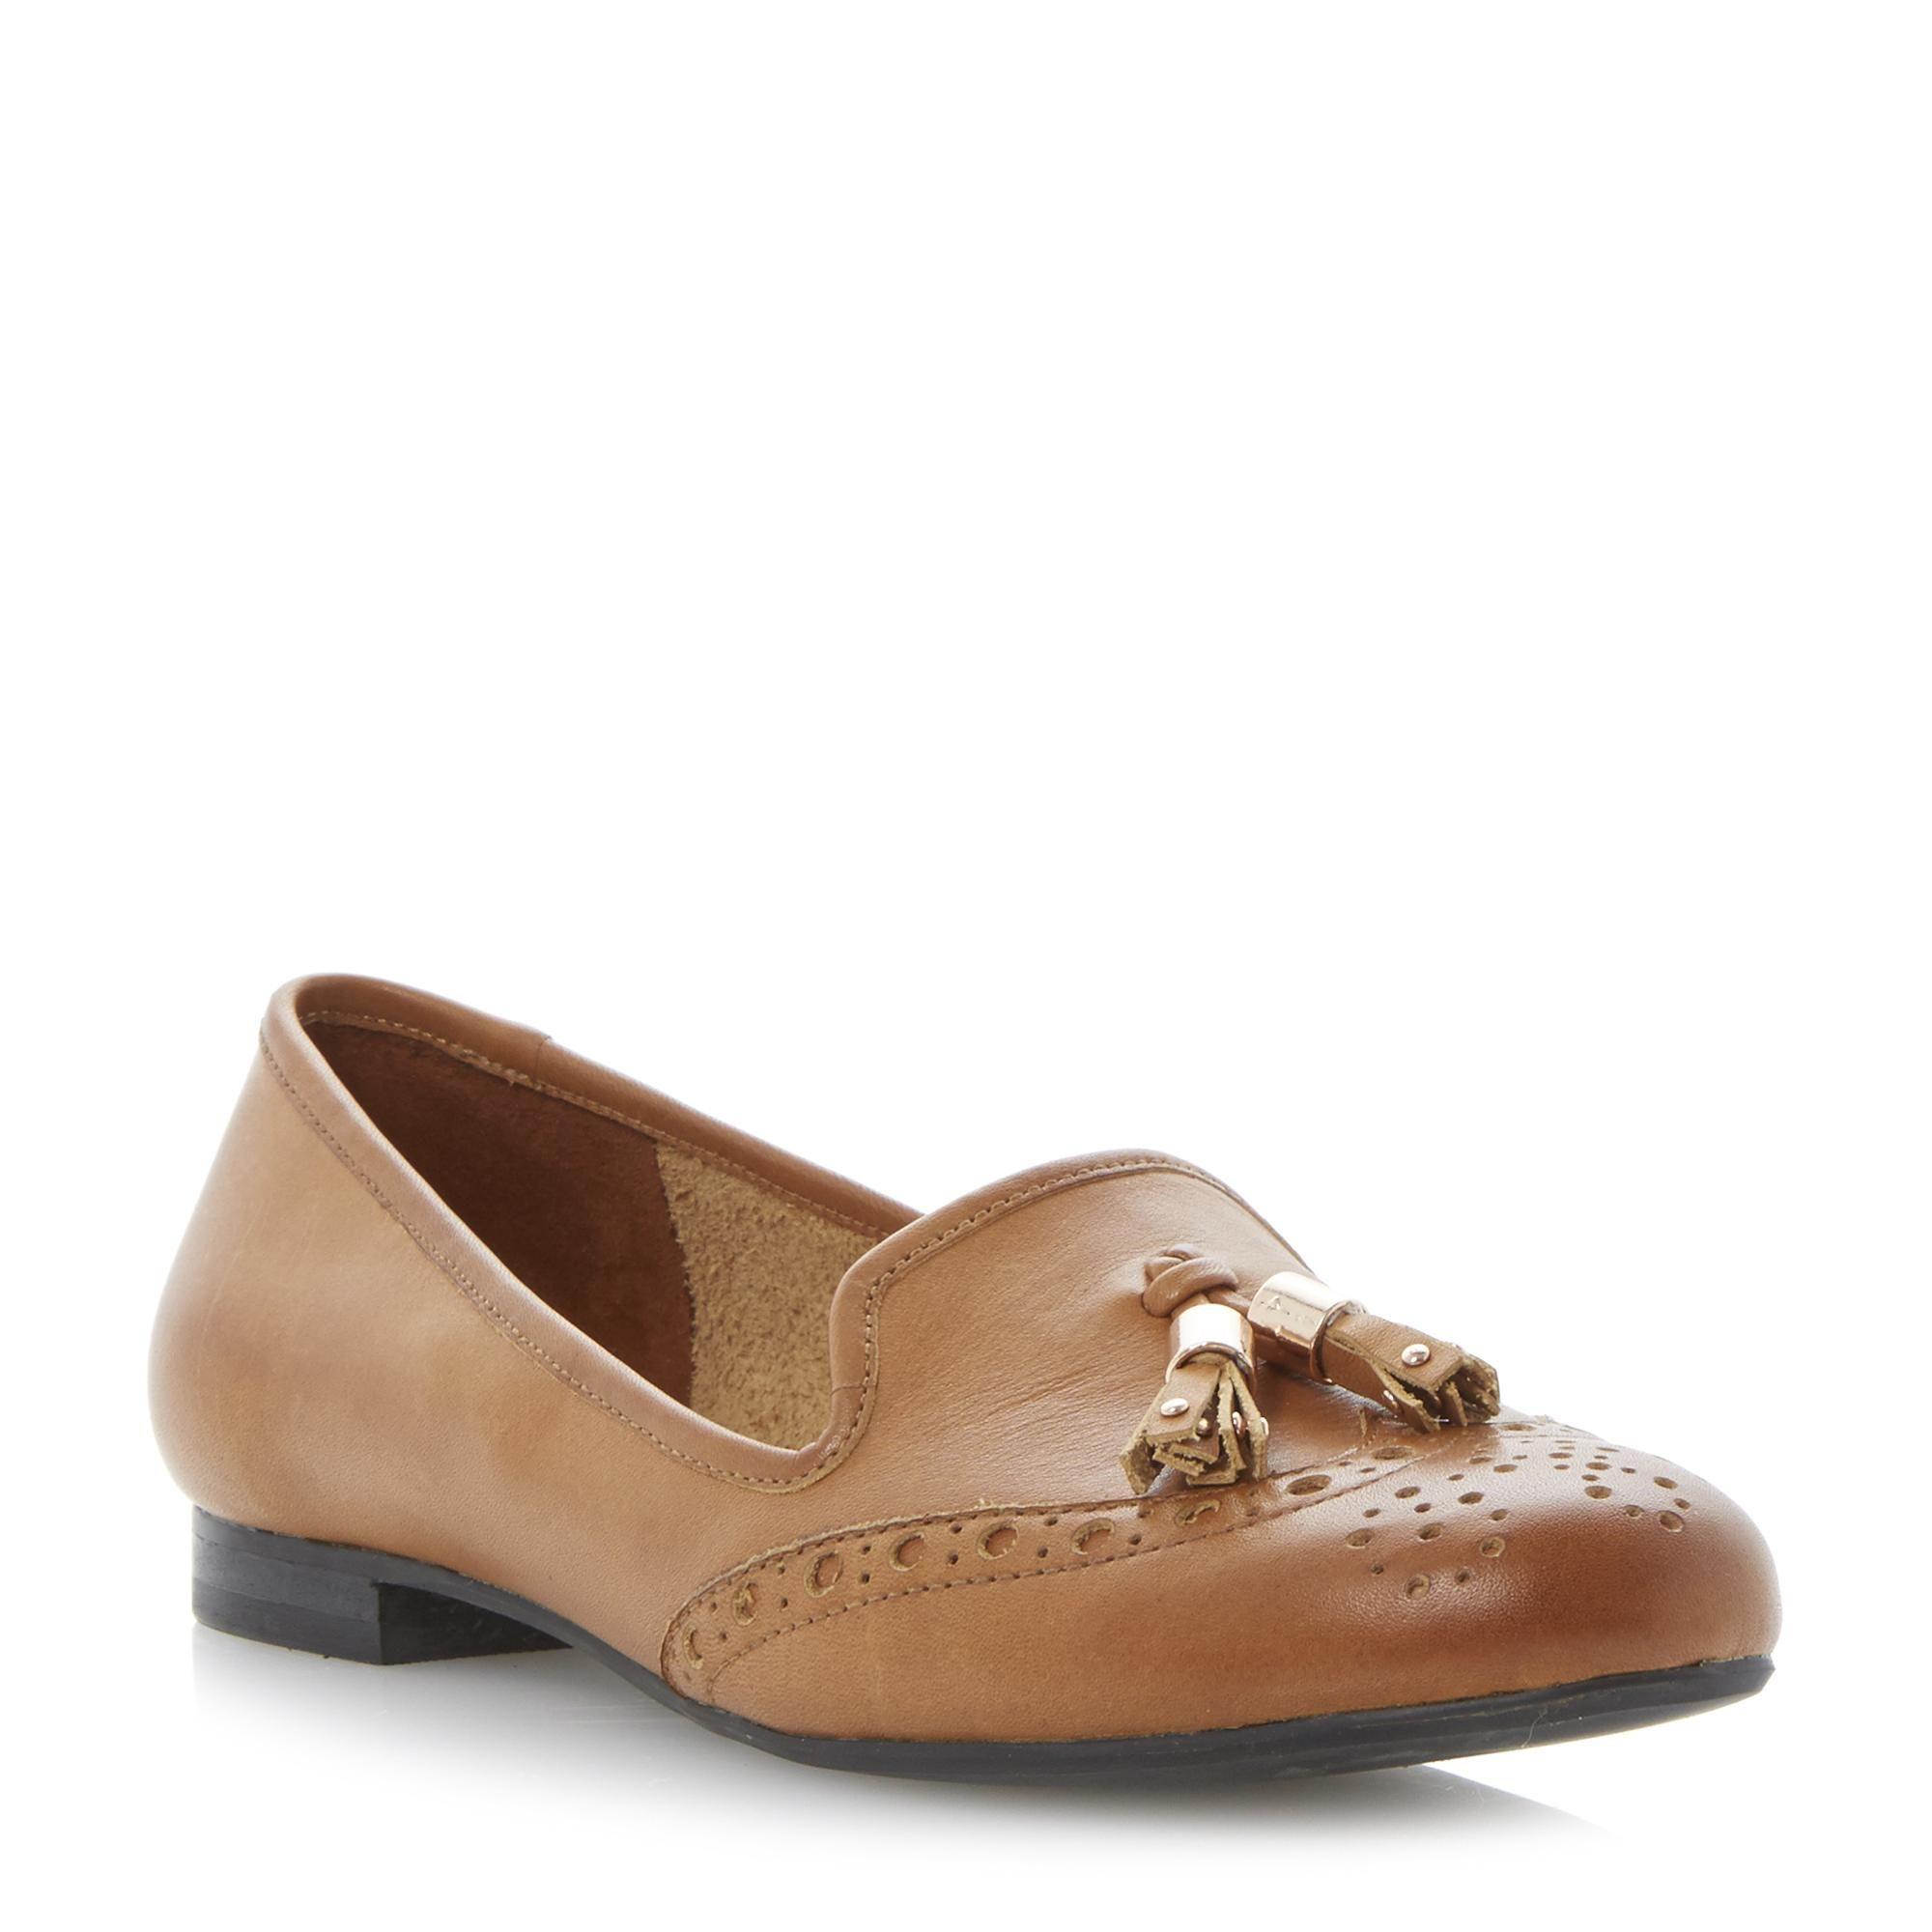 DUNE LADIES LOKI - Brogue Tassel Detail Loafer - tan | Dune Shoes Online